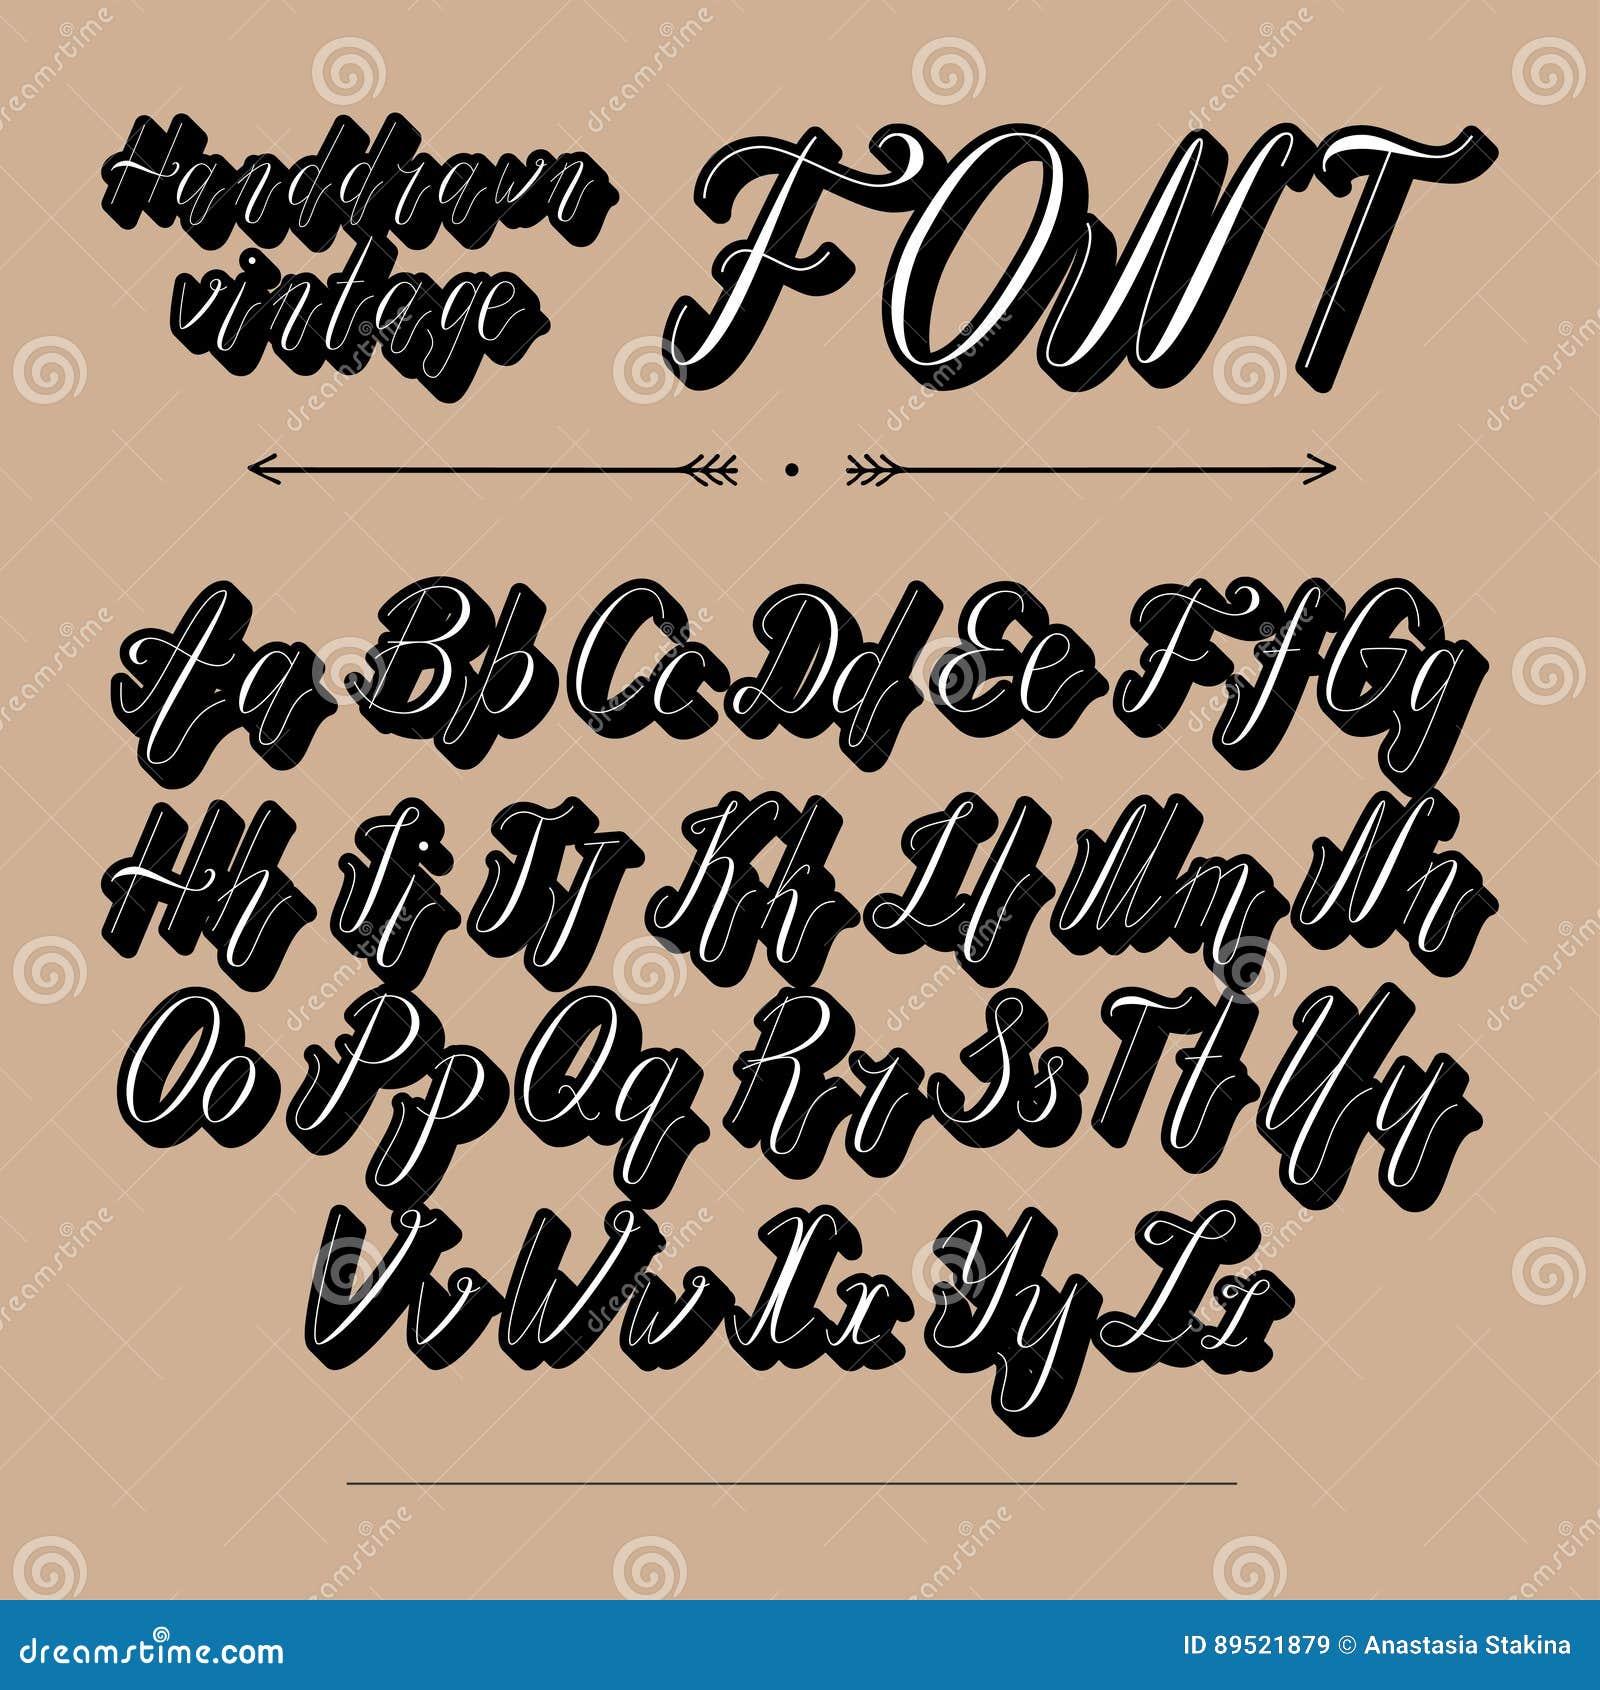 Handwritten Lettering Font Alphabet Stock Vector - Illustration of